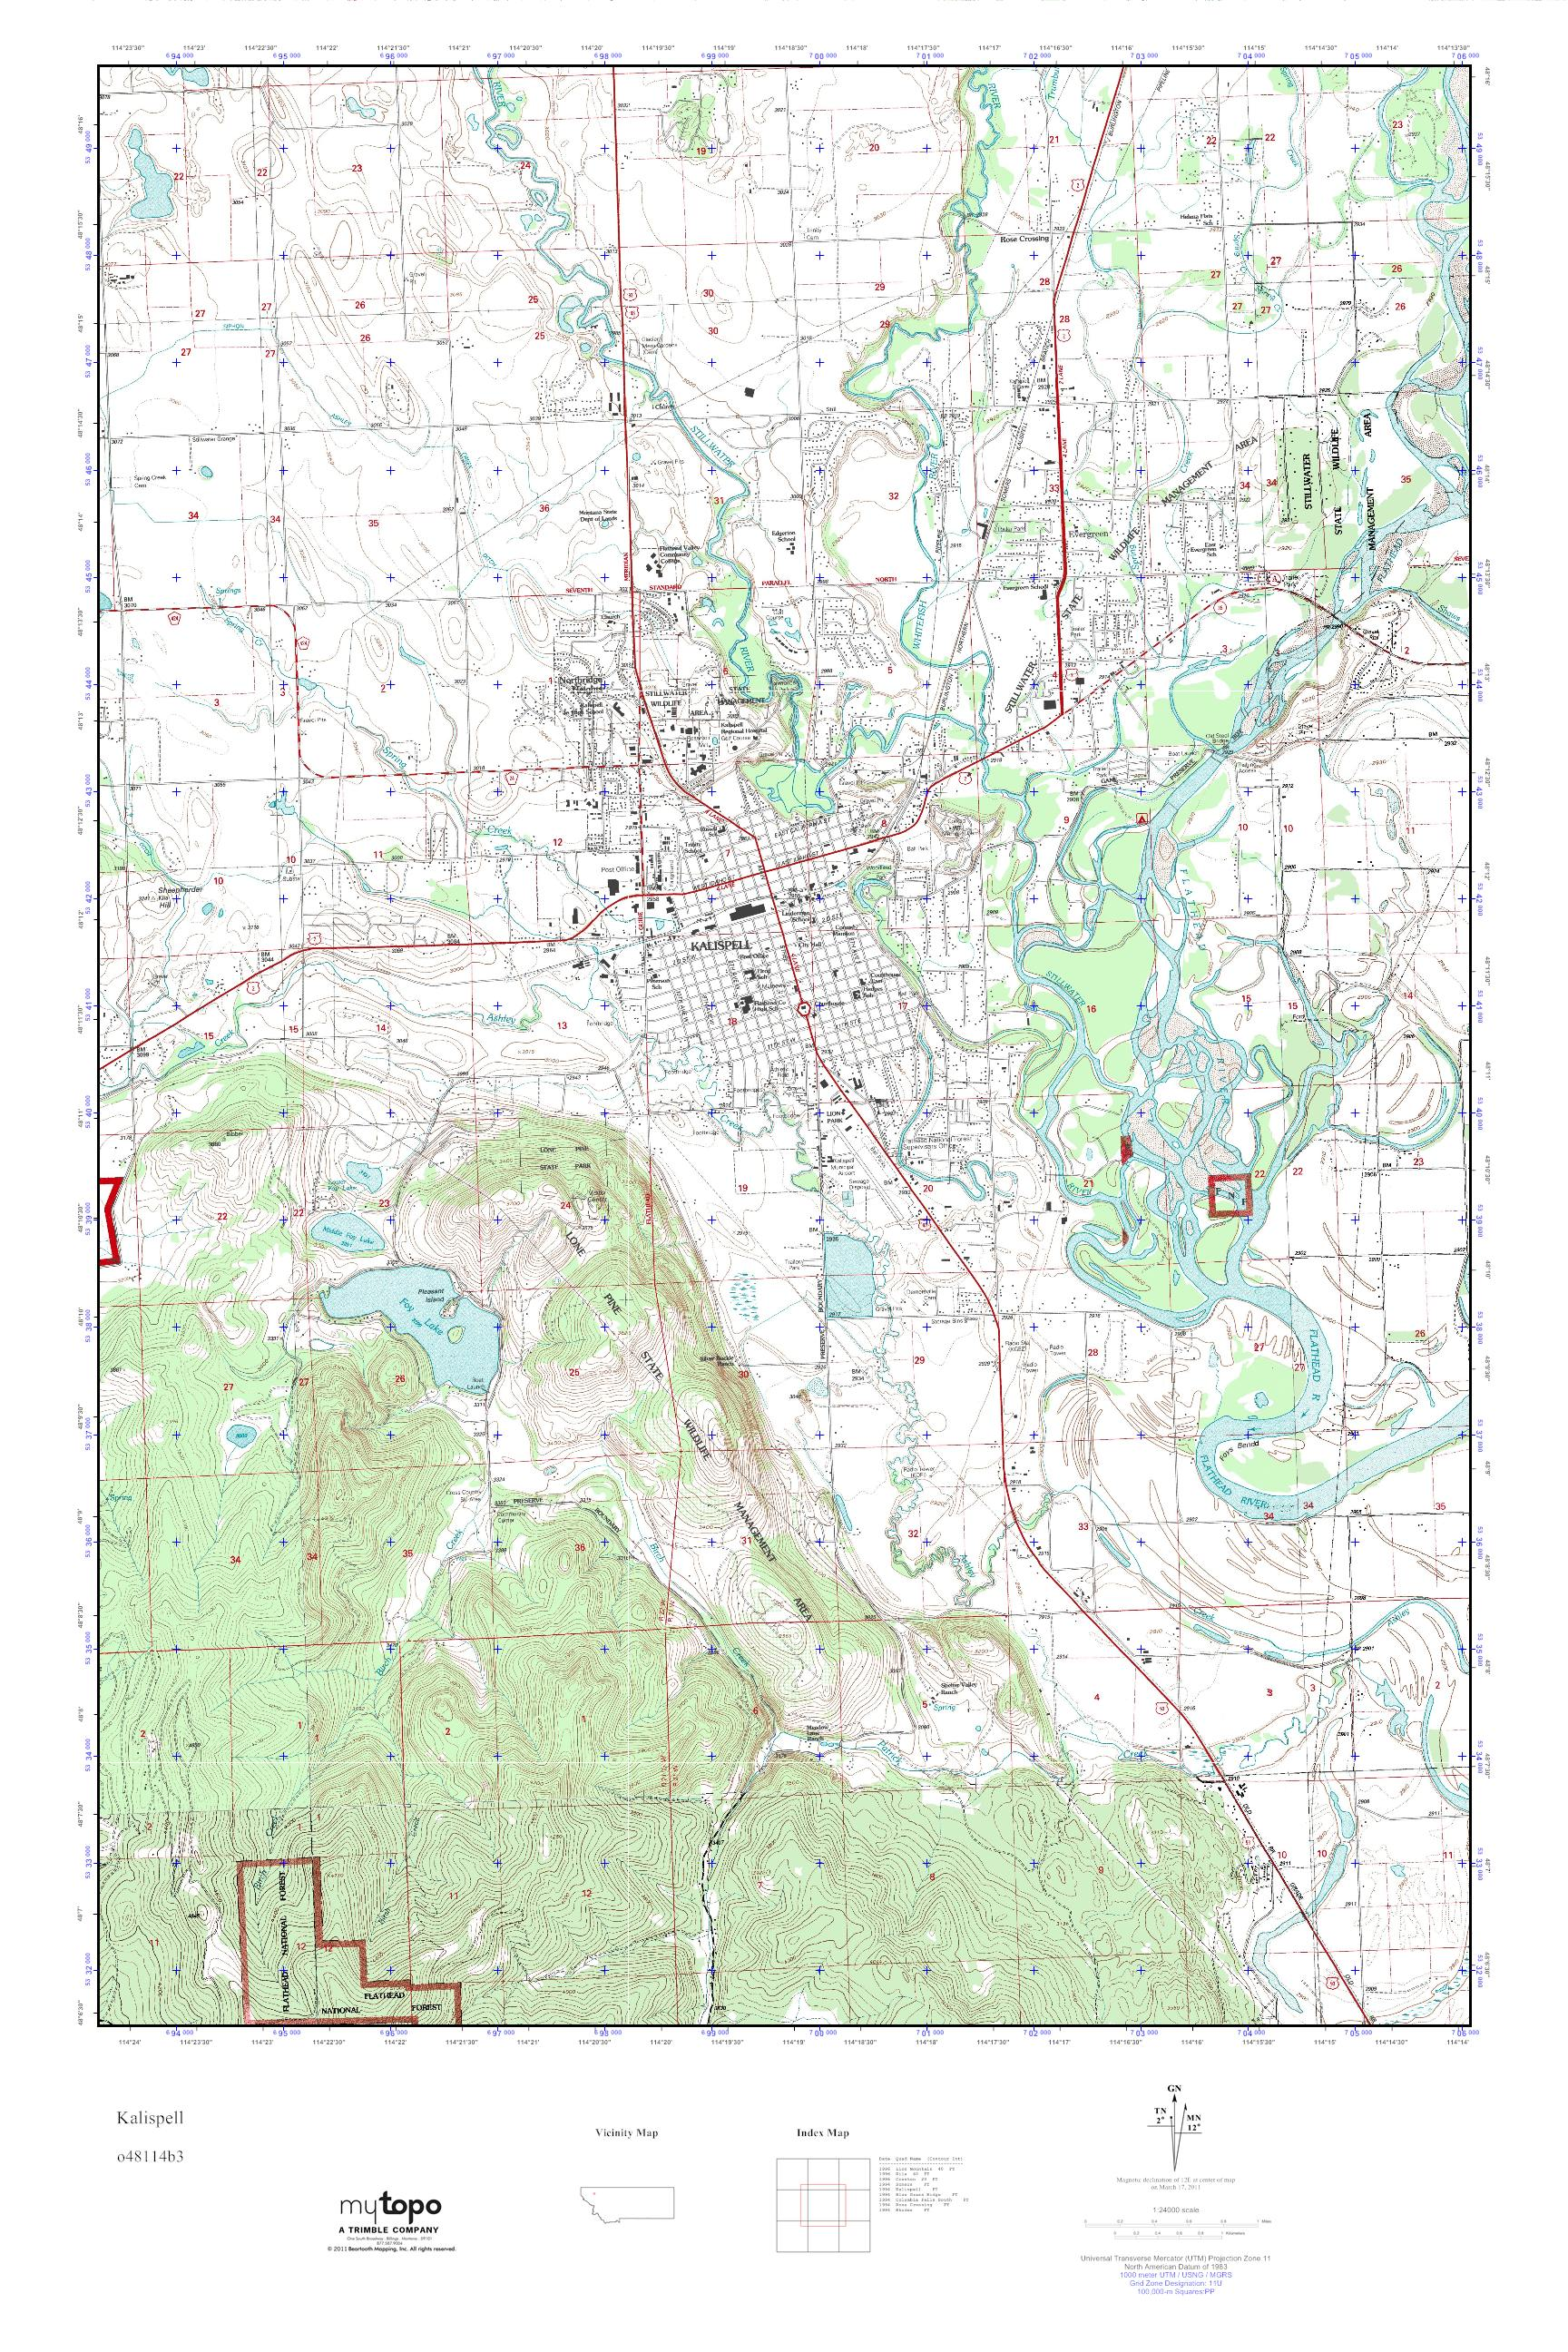 Mytopo Kalispell Montana Usgs Quad Topo Map